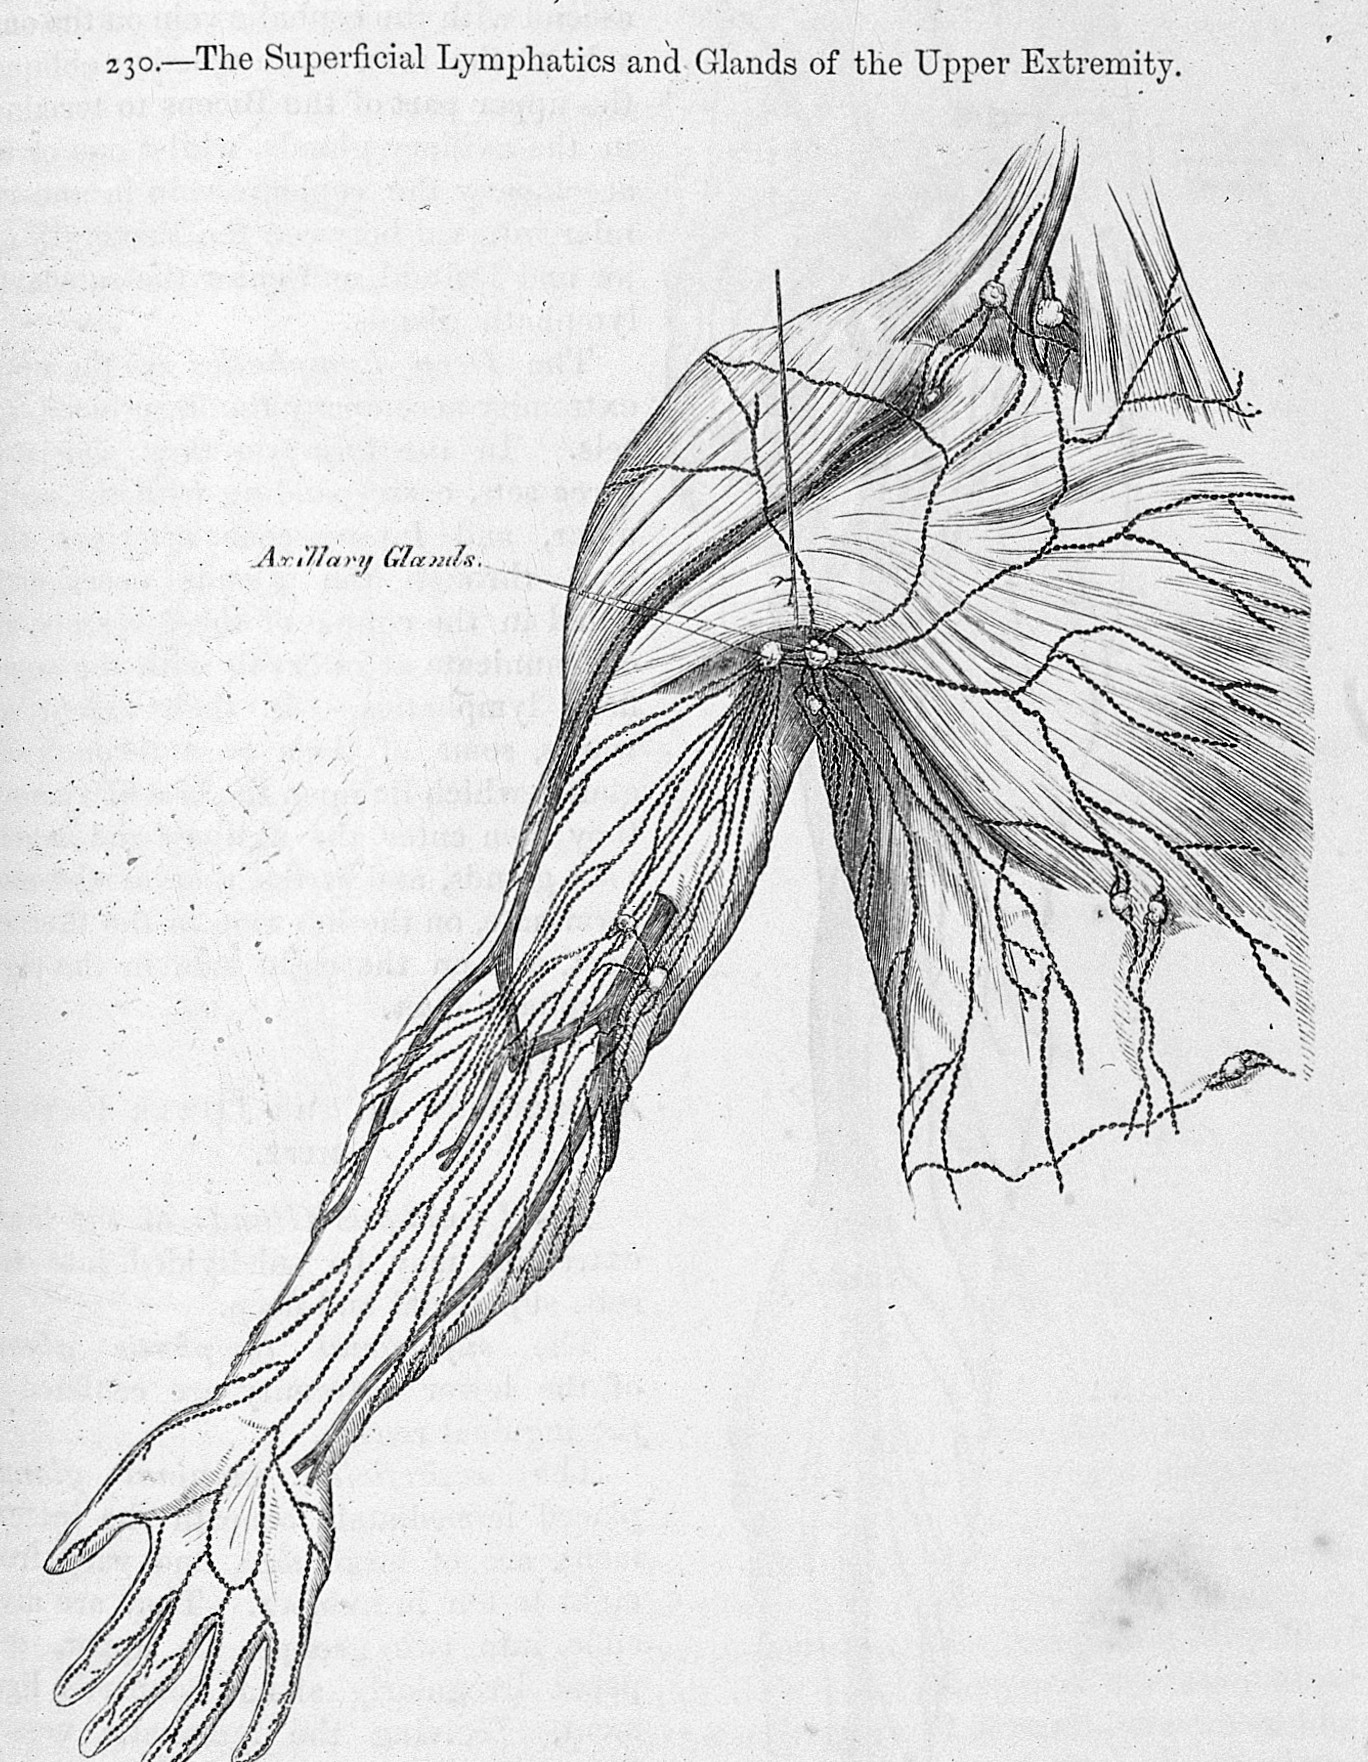 Fileh Gray Anatomy Descriptive And Surgical Wellcome L0028363